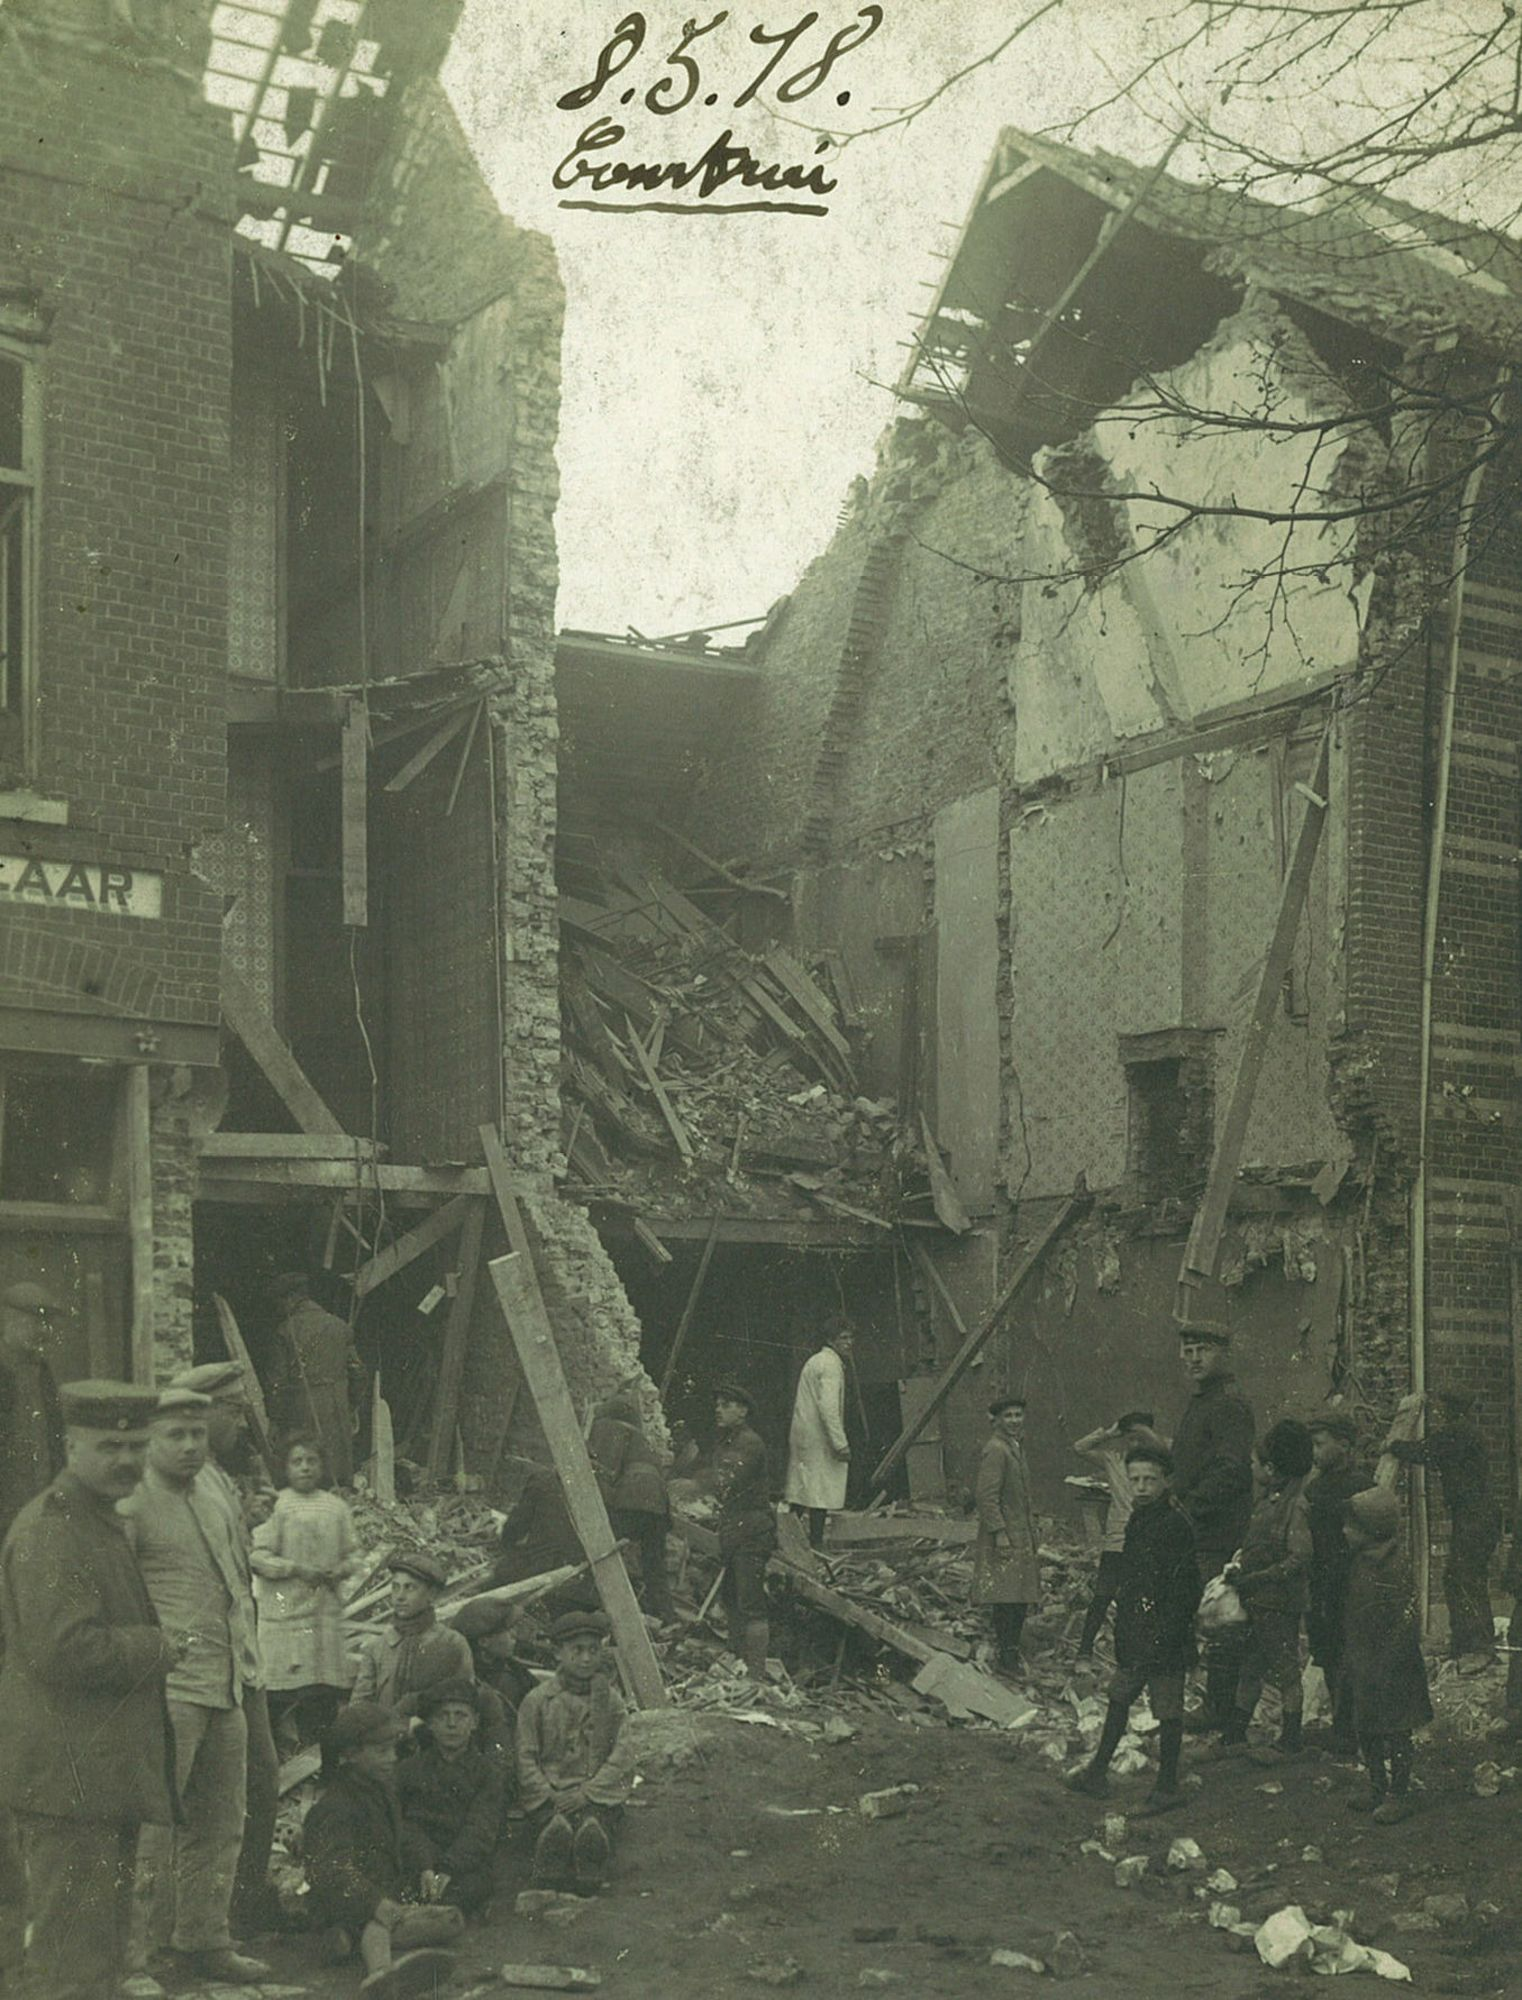 Albums Ghyoot 4_069 Meensesteenweg bombardement 08.05.1918 WO I